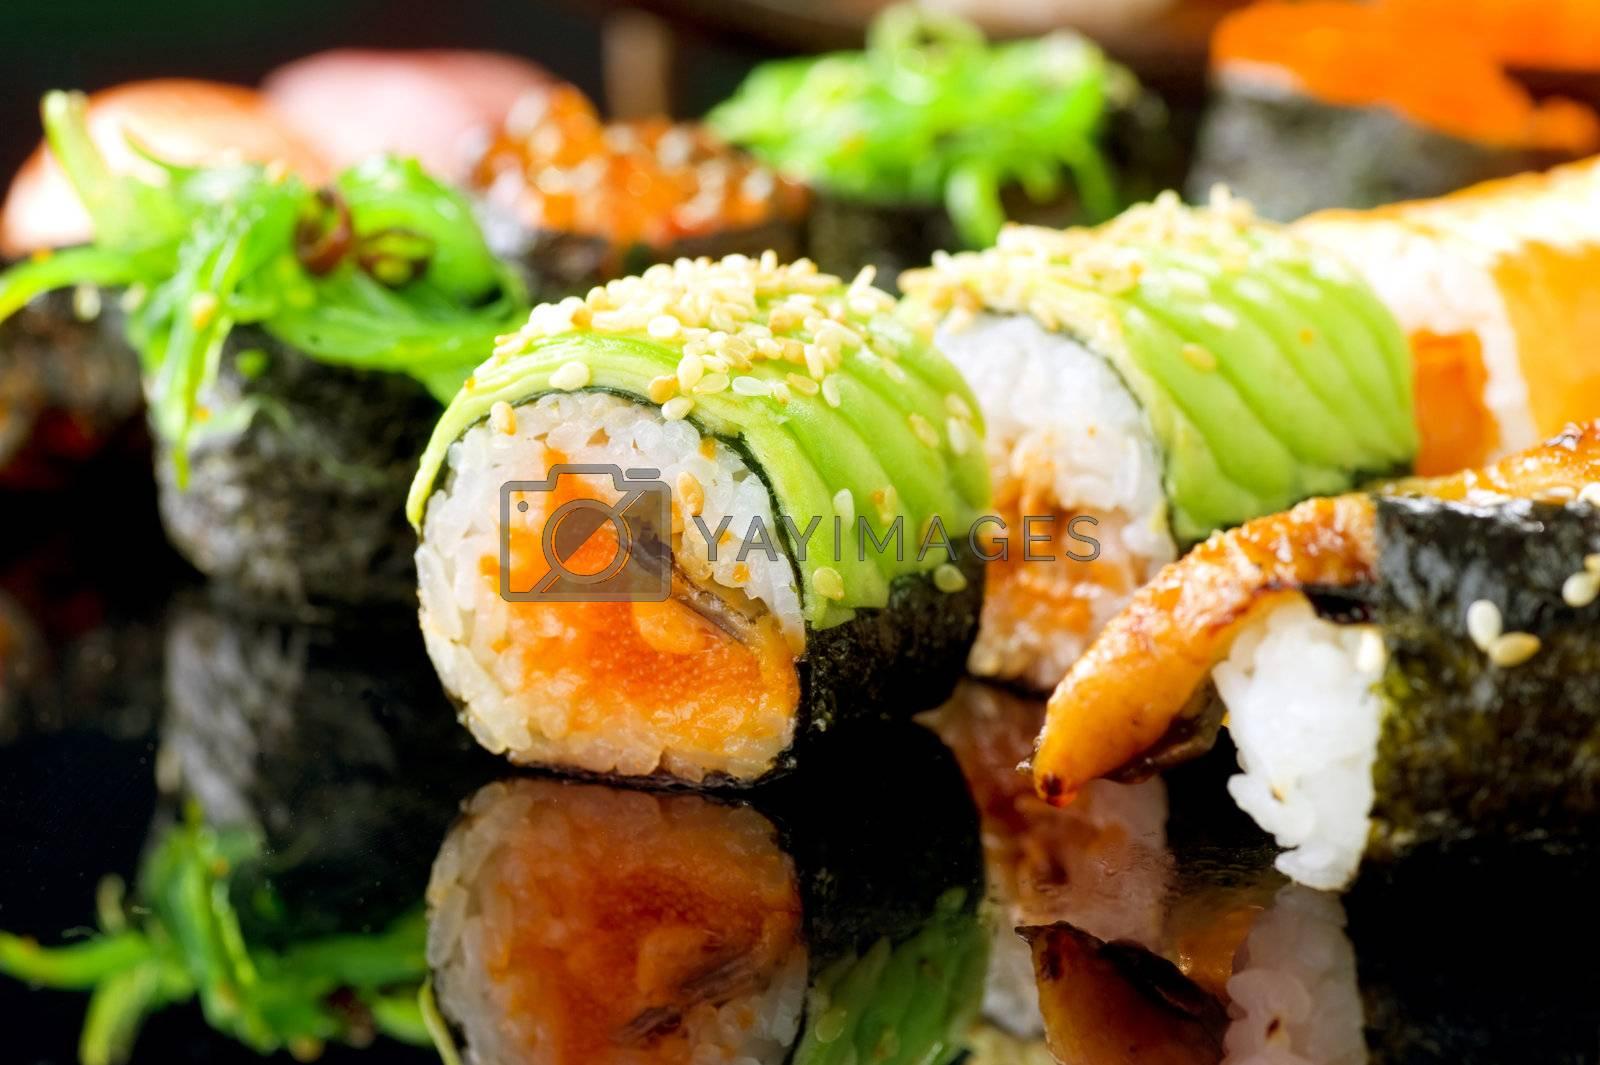 Sushi by Subbotina Anna